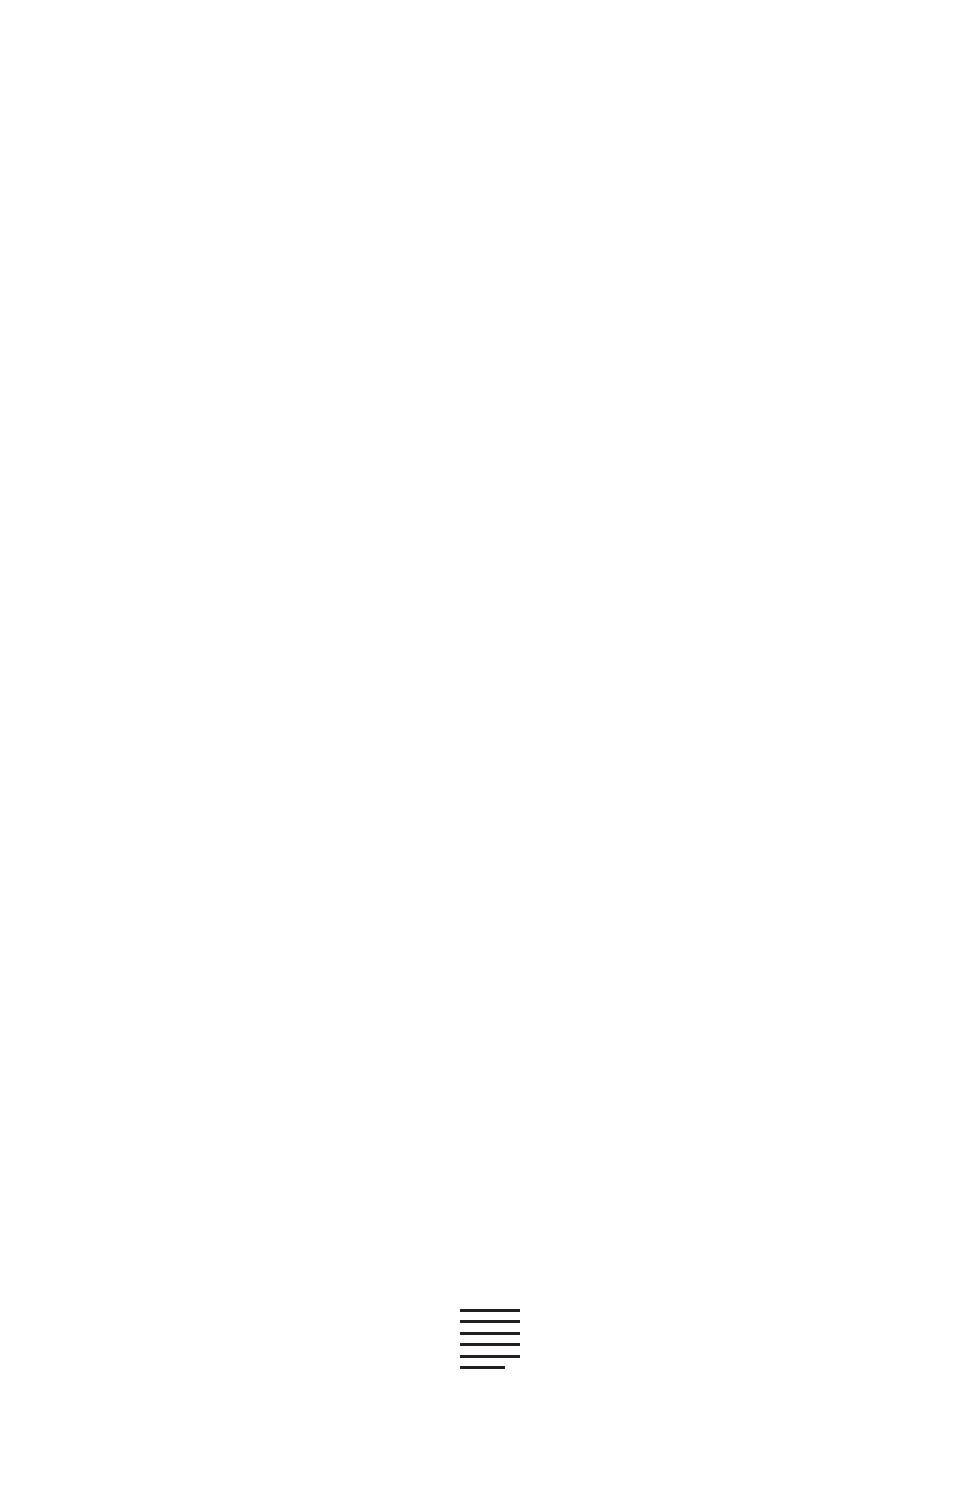 Королёва М. А. «Чисто по-русски» Часть 1 by Premia Prosvetitel - issuu a303459cfcb